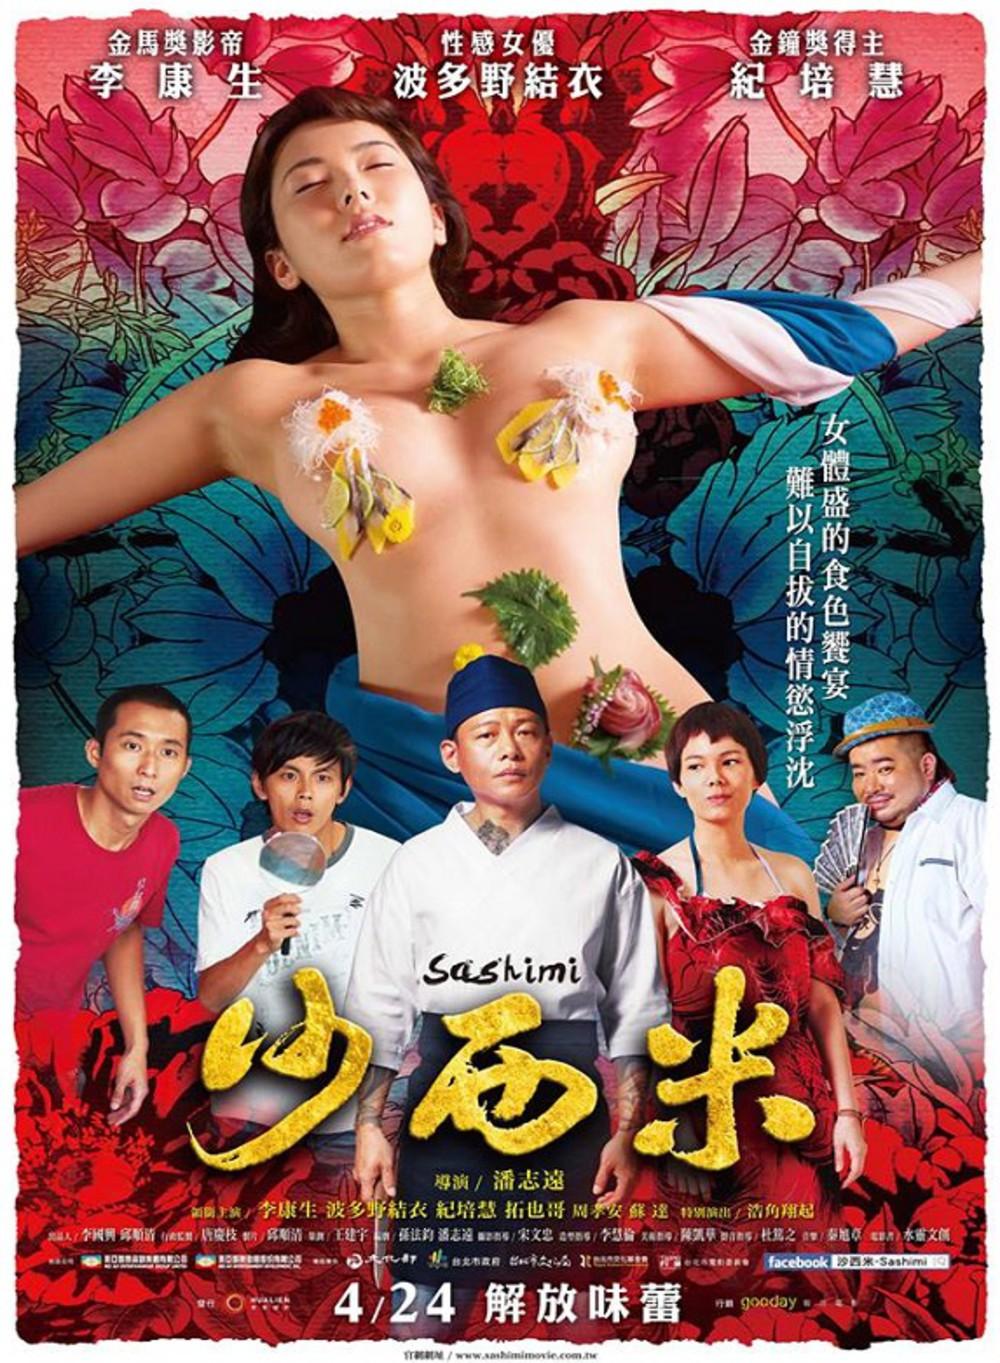 Sashimi (2015) นำแสดงโดย Yui Hatano : พากย์ไทย